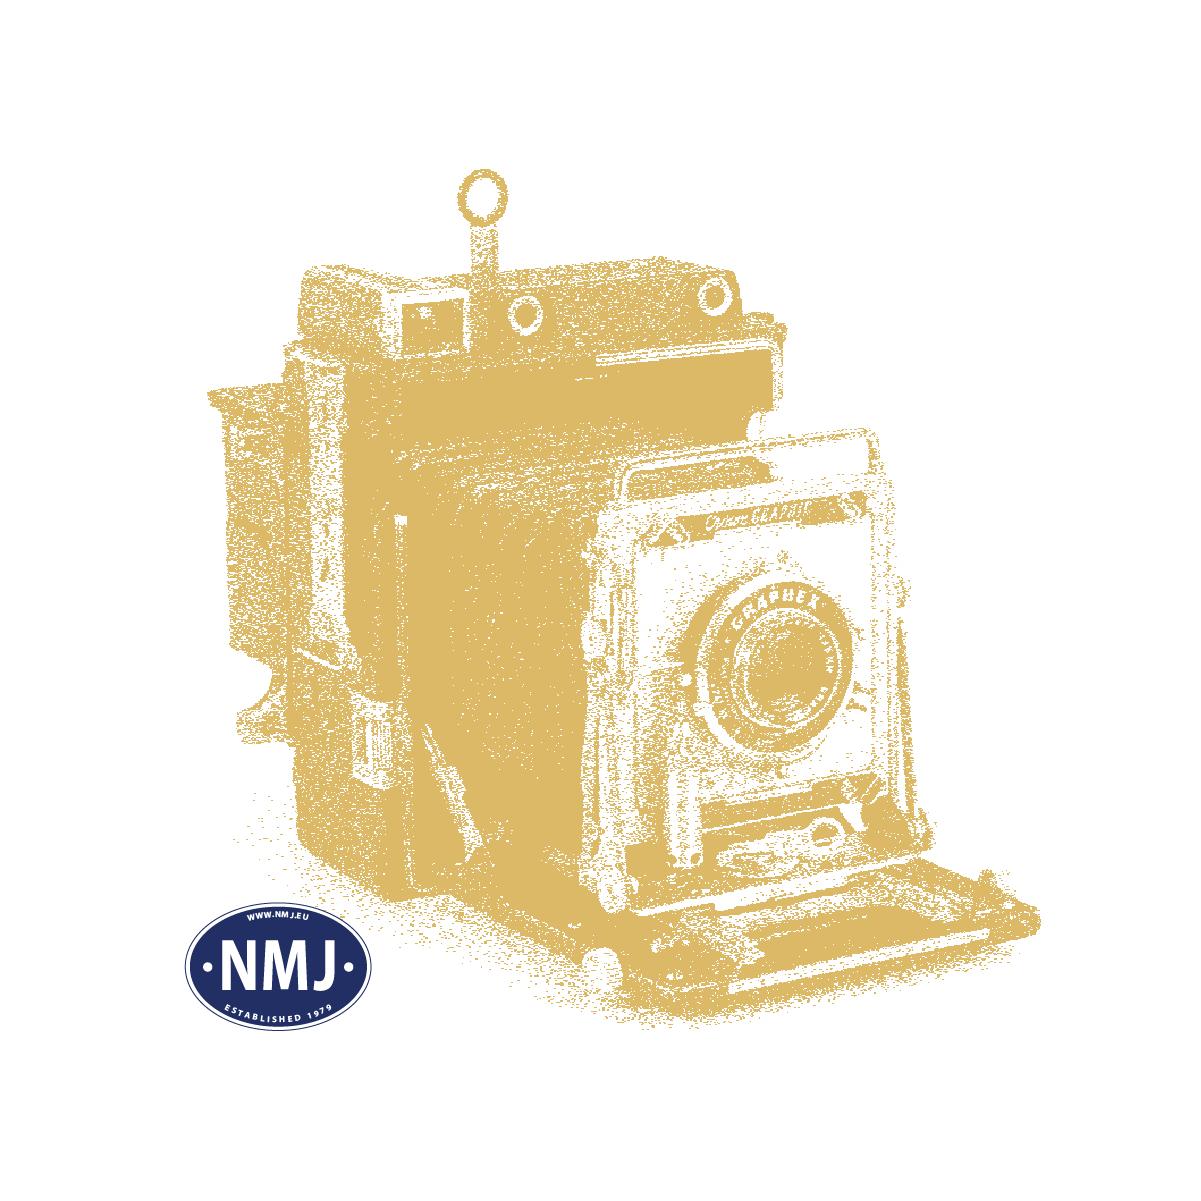 NMJT131.102 - NMJ Topline NSB B3-225502 type 3, Gammeldesign